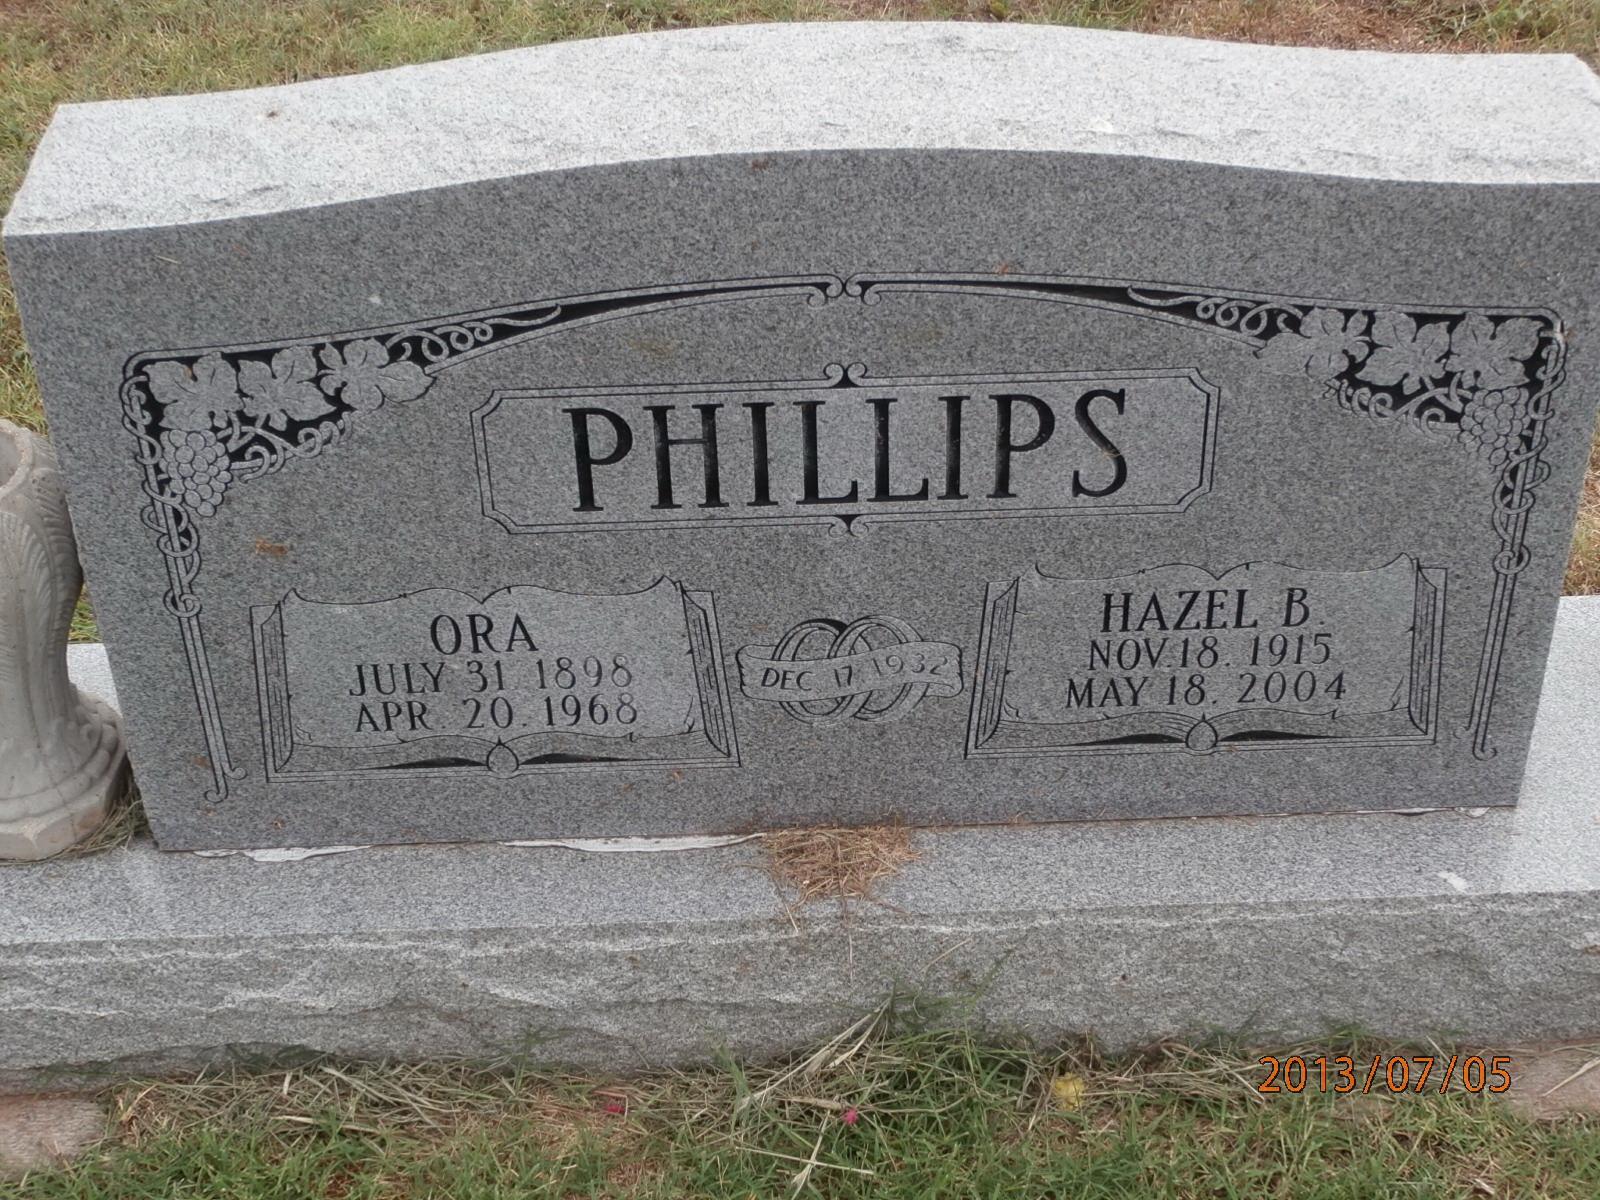 Ora Phillips